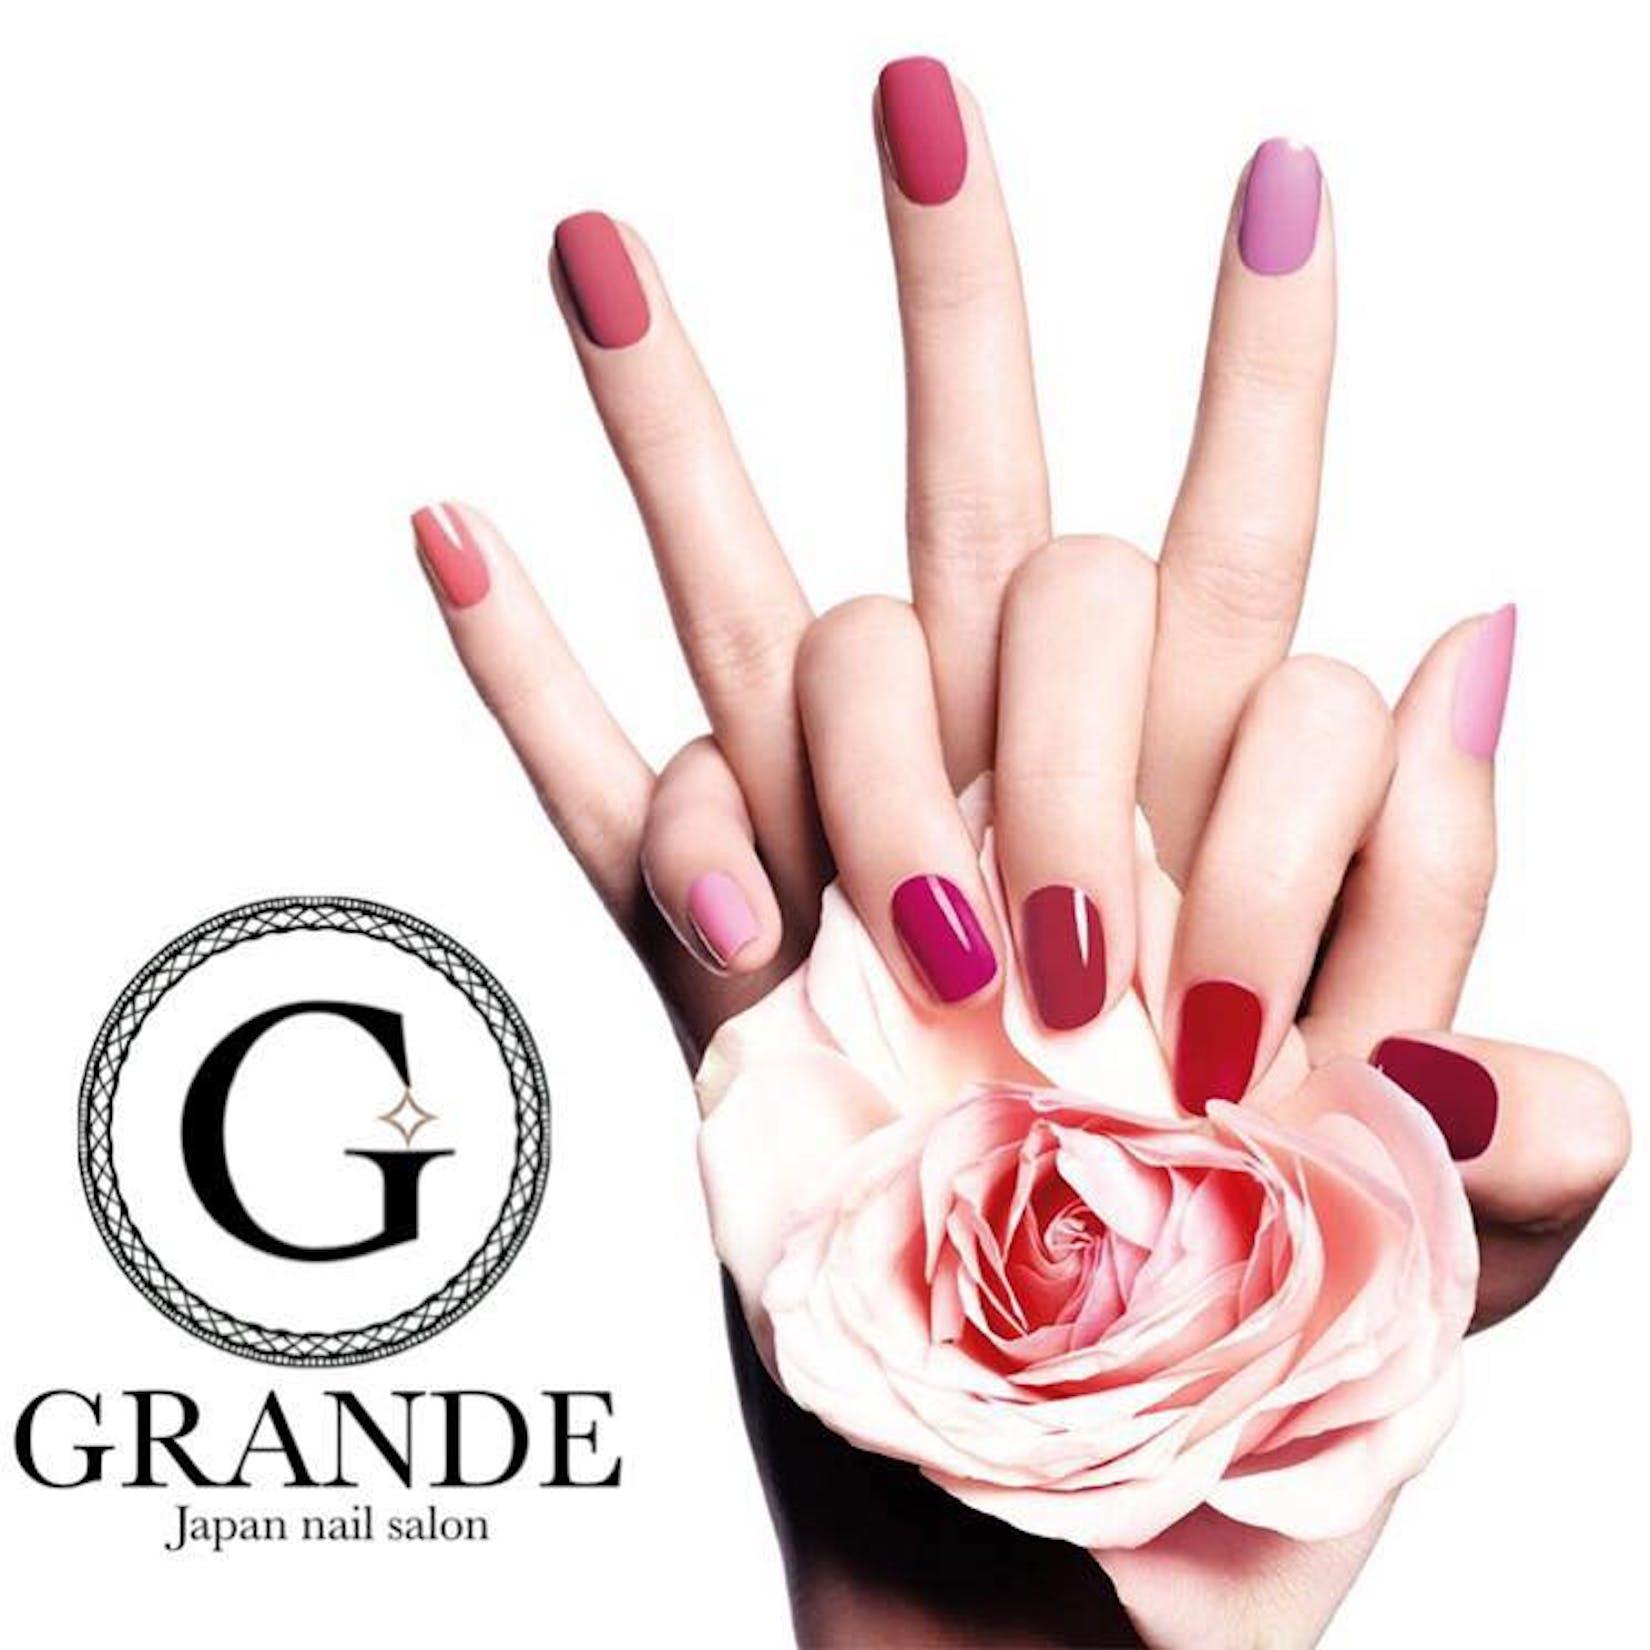 Grande Beauty Spa Japan | Beauty